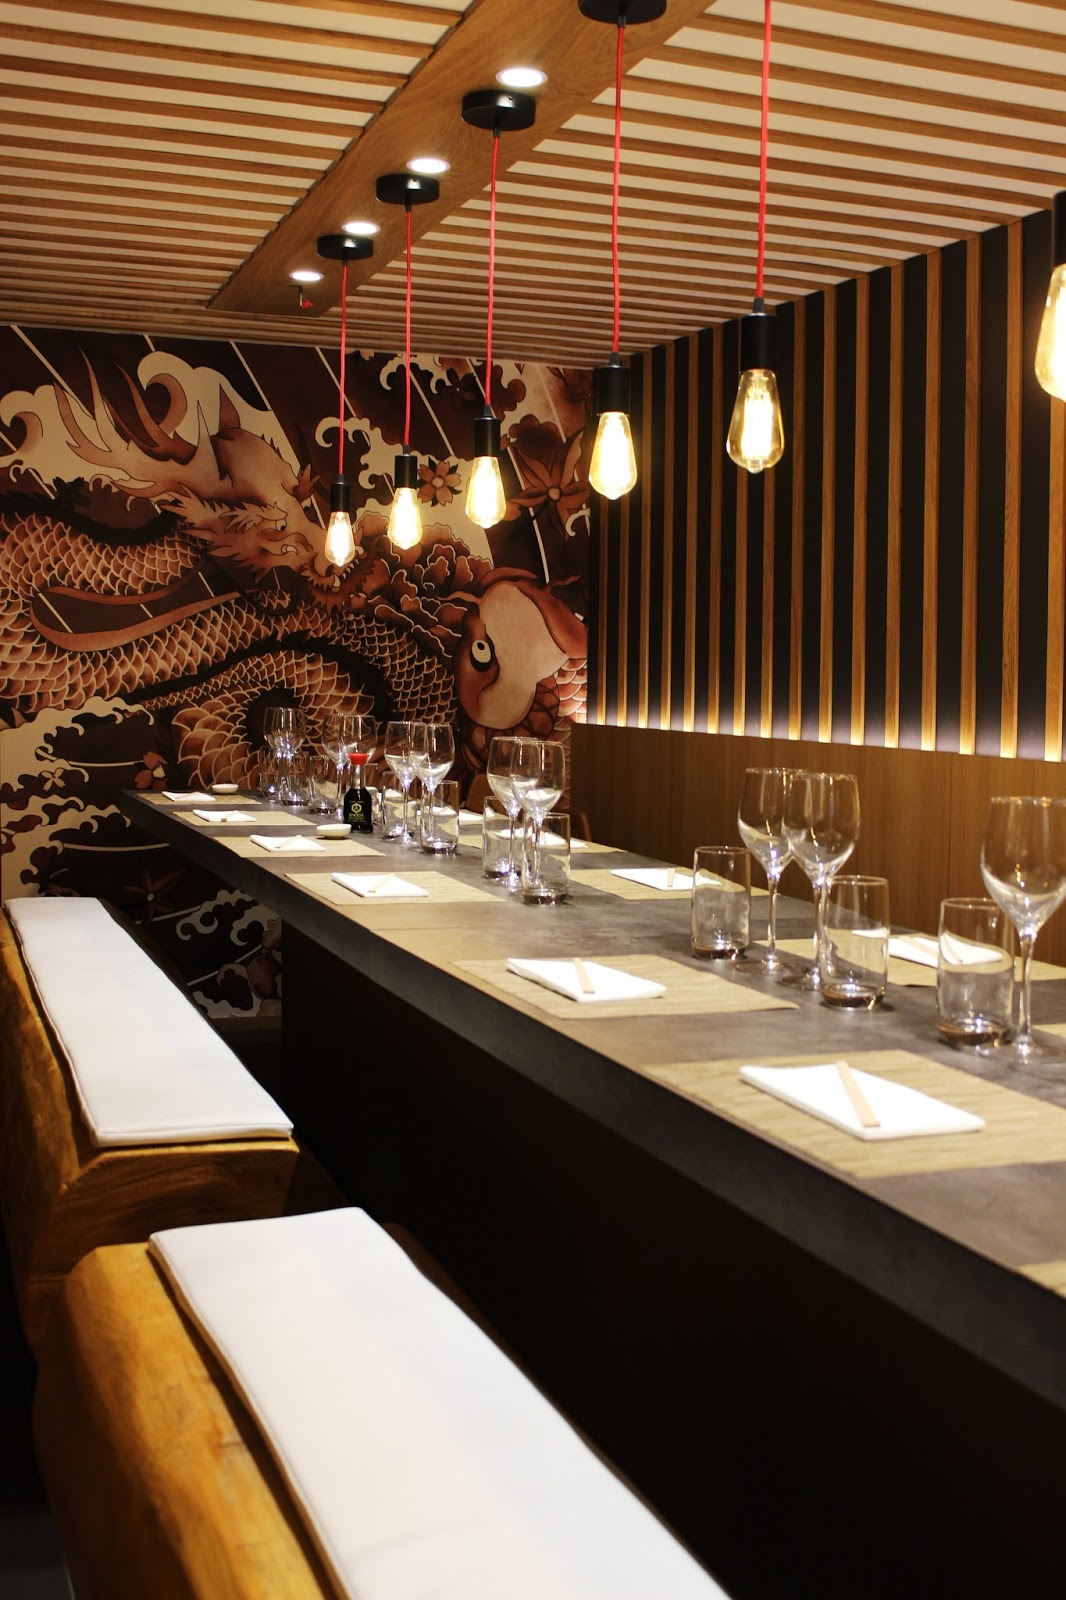 L 39 instant resto ko sushi 13 100 aix en provence for Koi japonais aix en provence